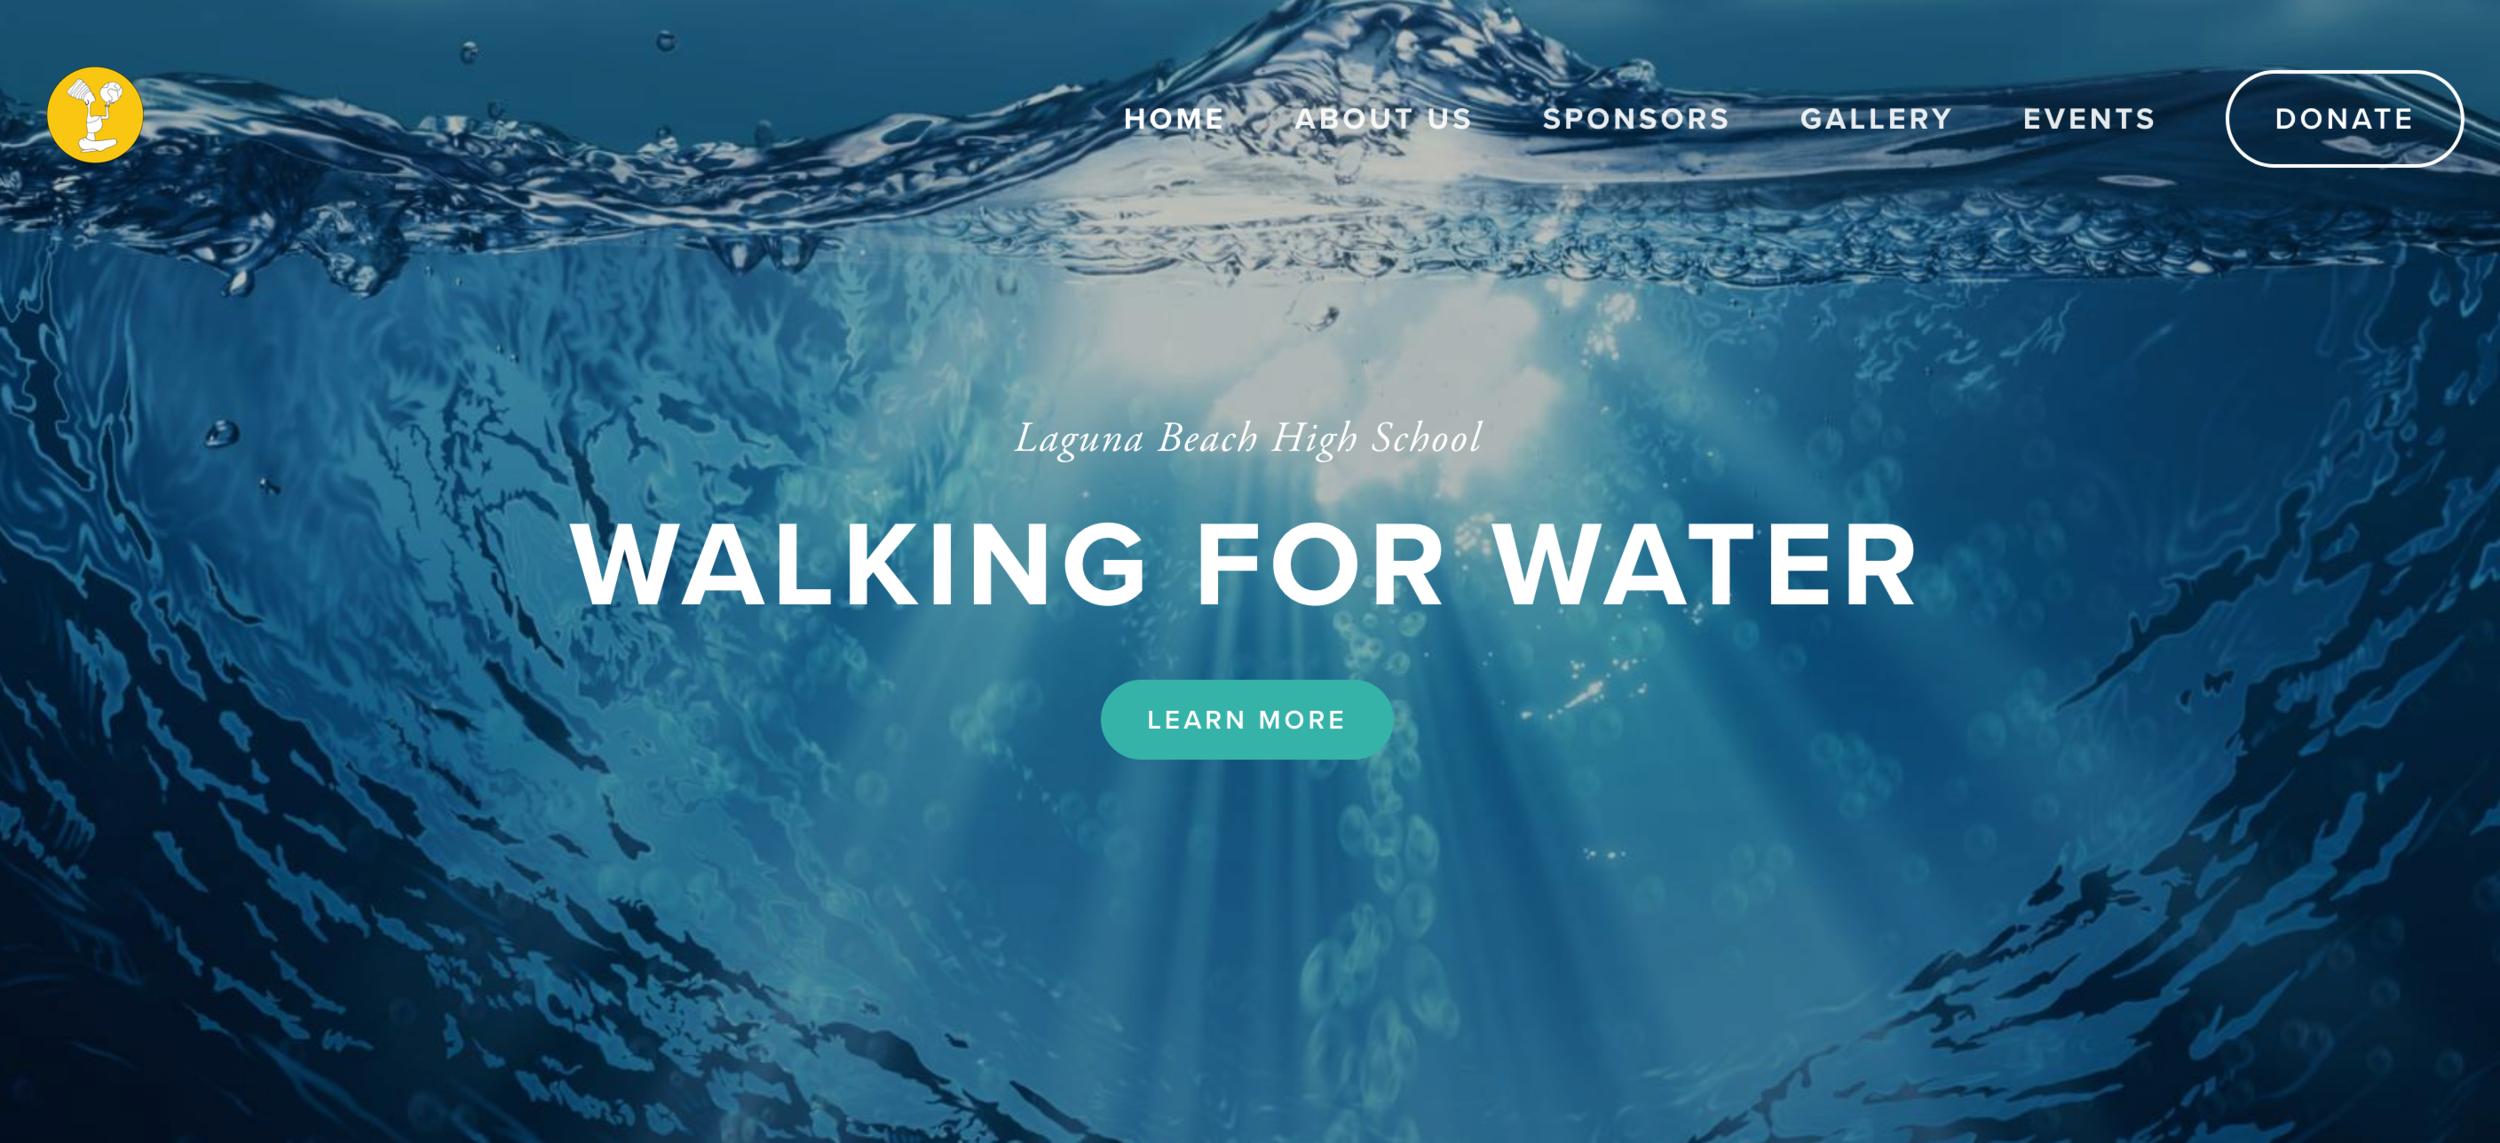 Non-Profit Laguna Beach High School, Walking for Water